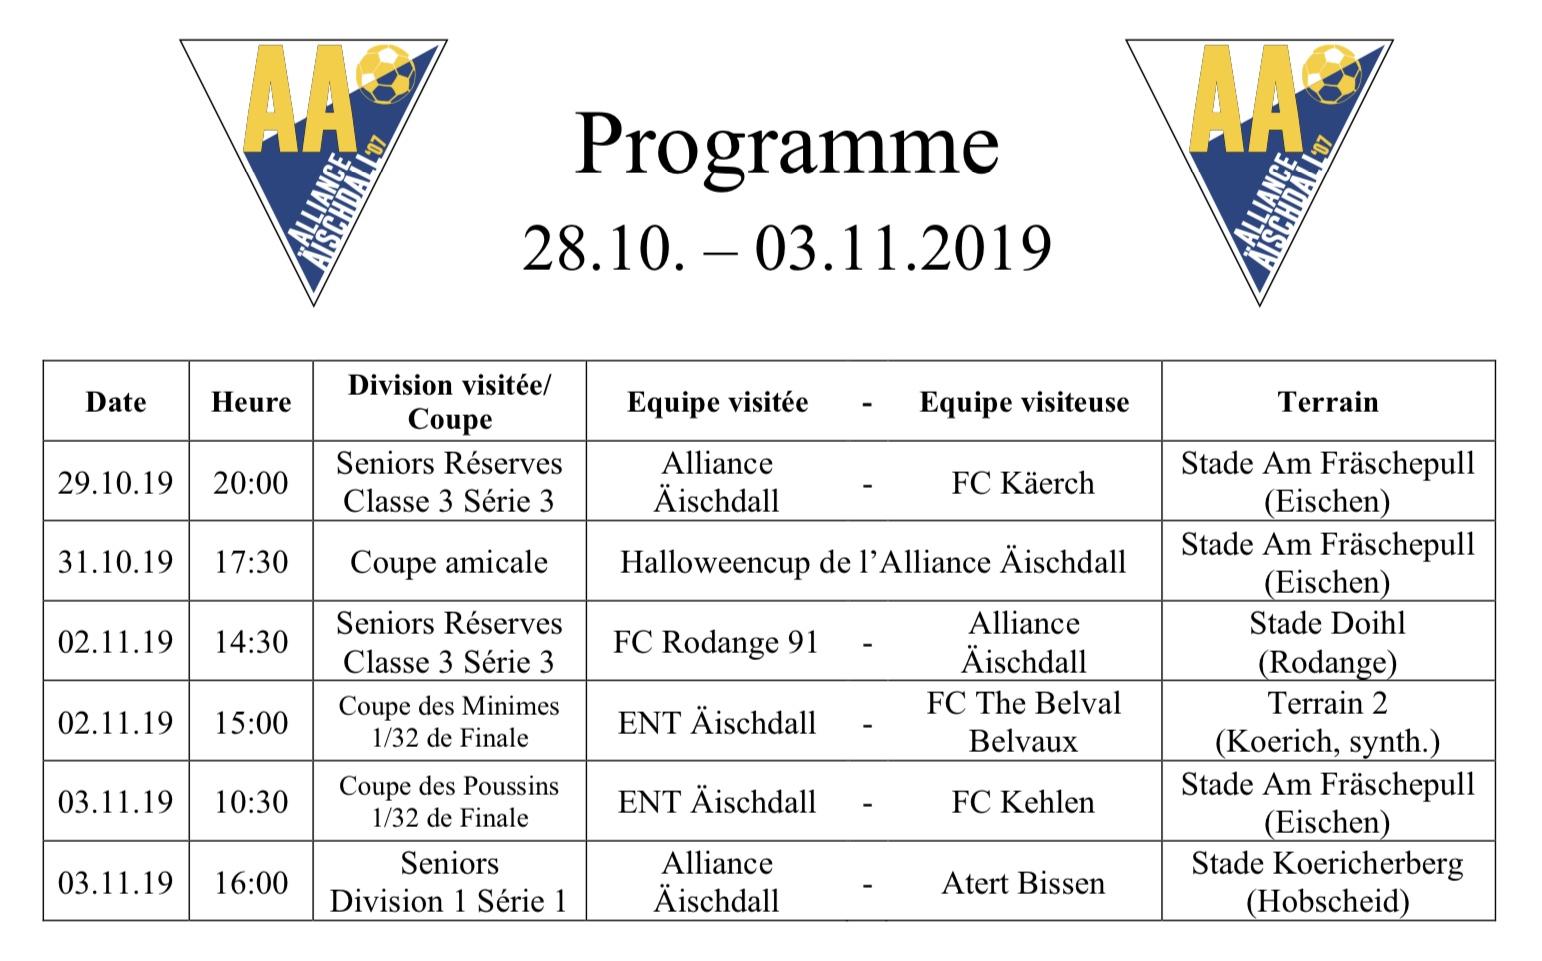 Programm 28.10.-03.11.2019